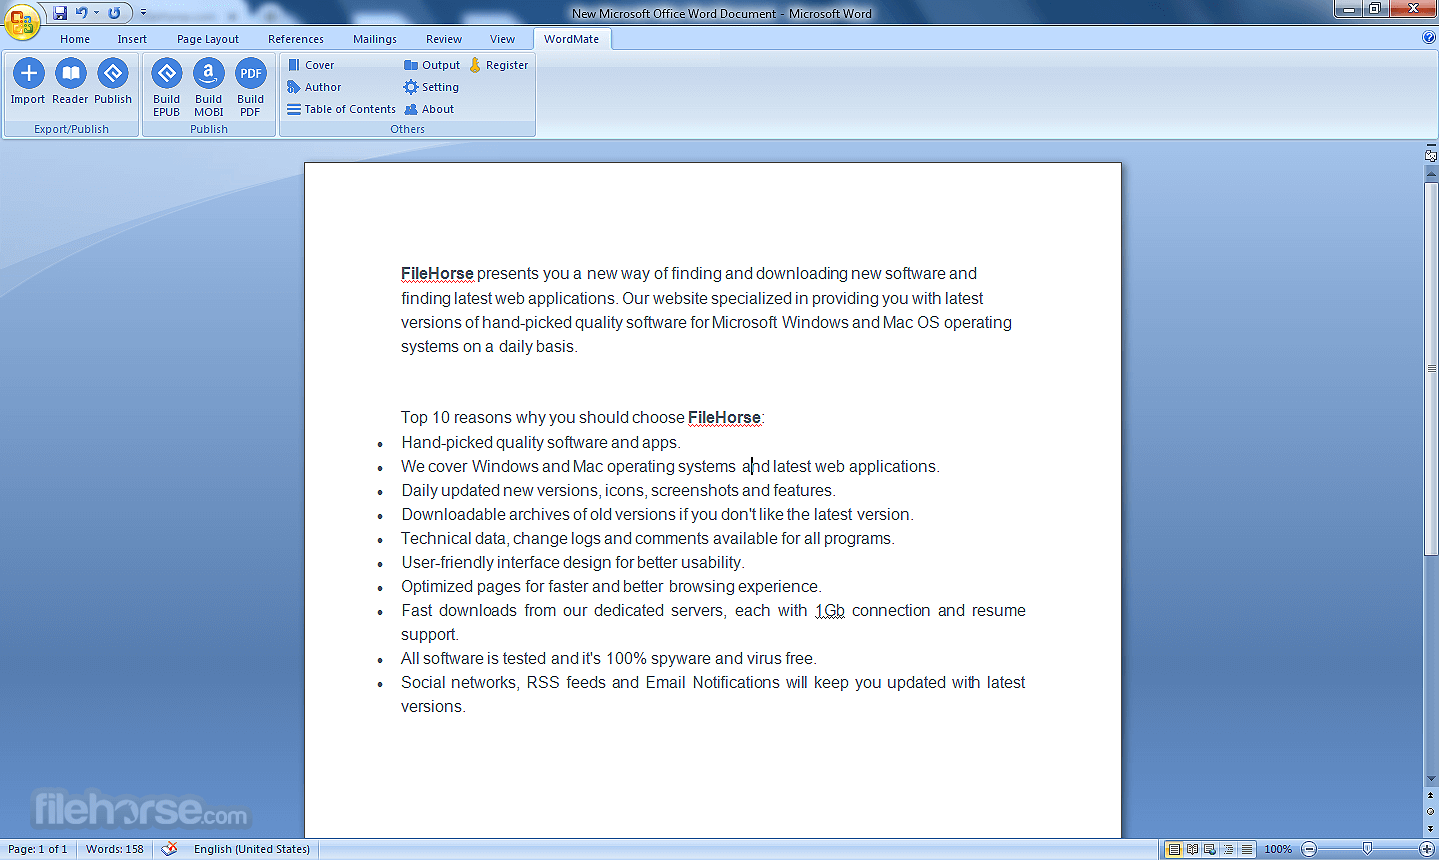 WordMate 1.0.1.48 Screenshot 1